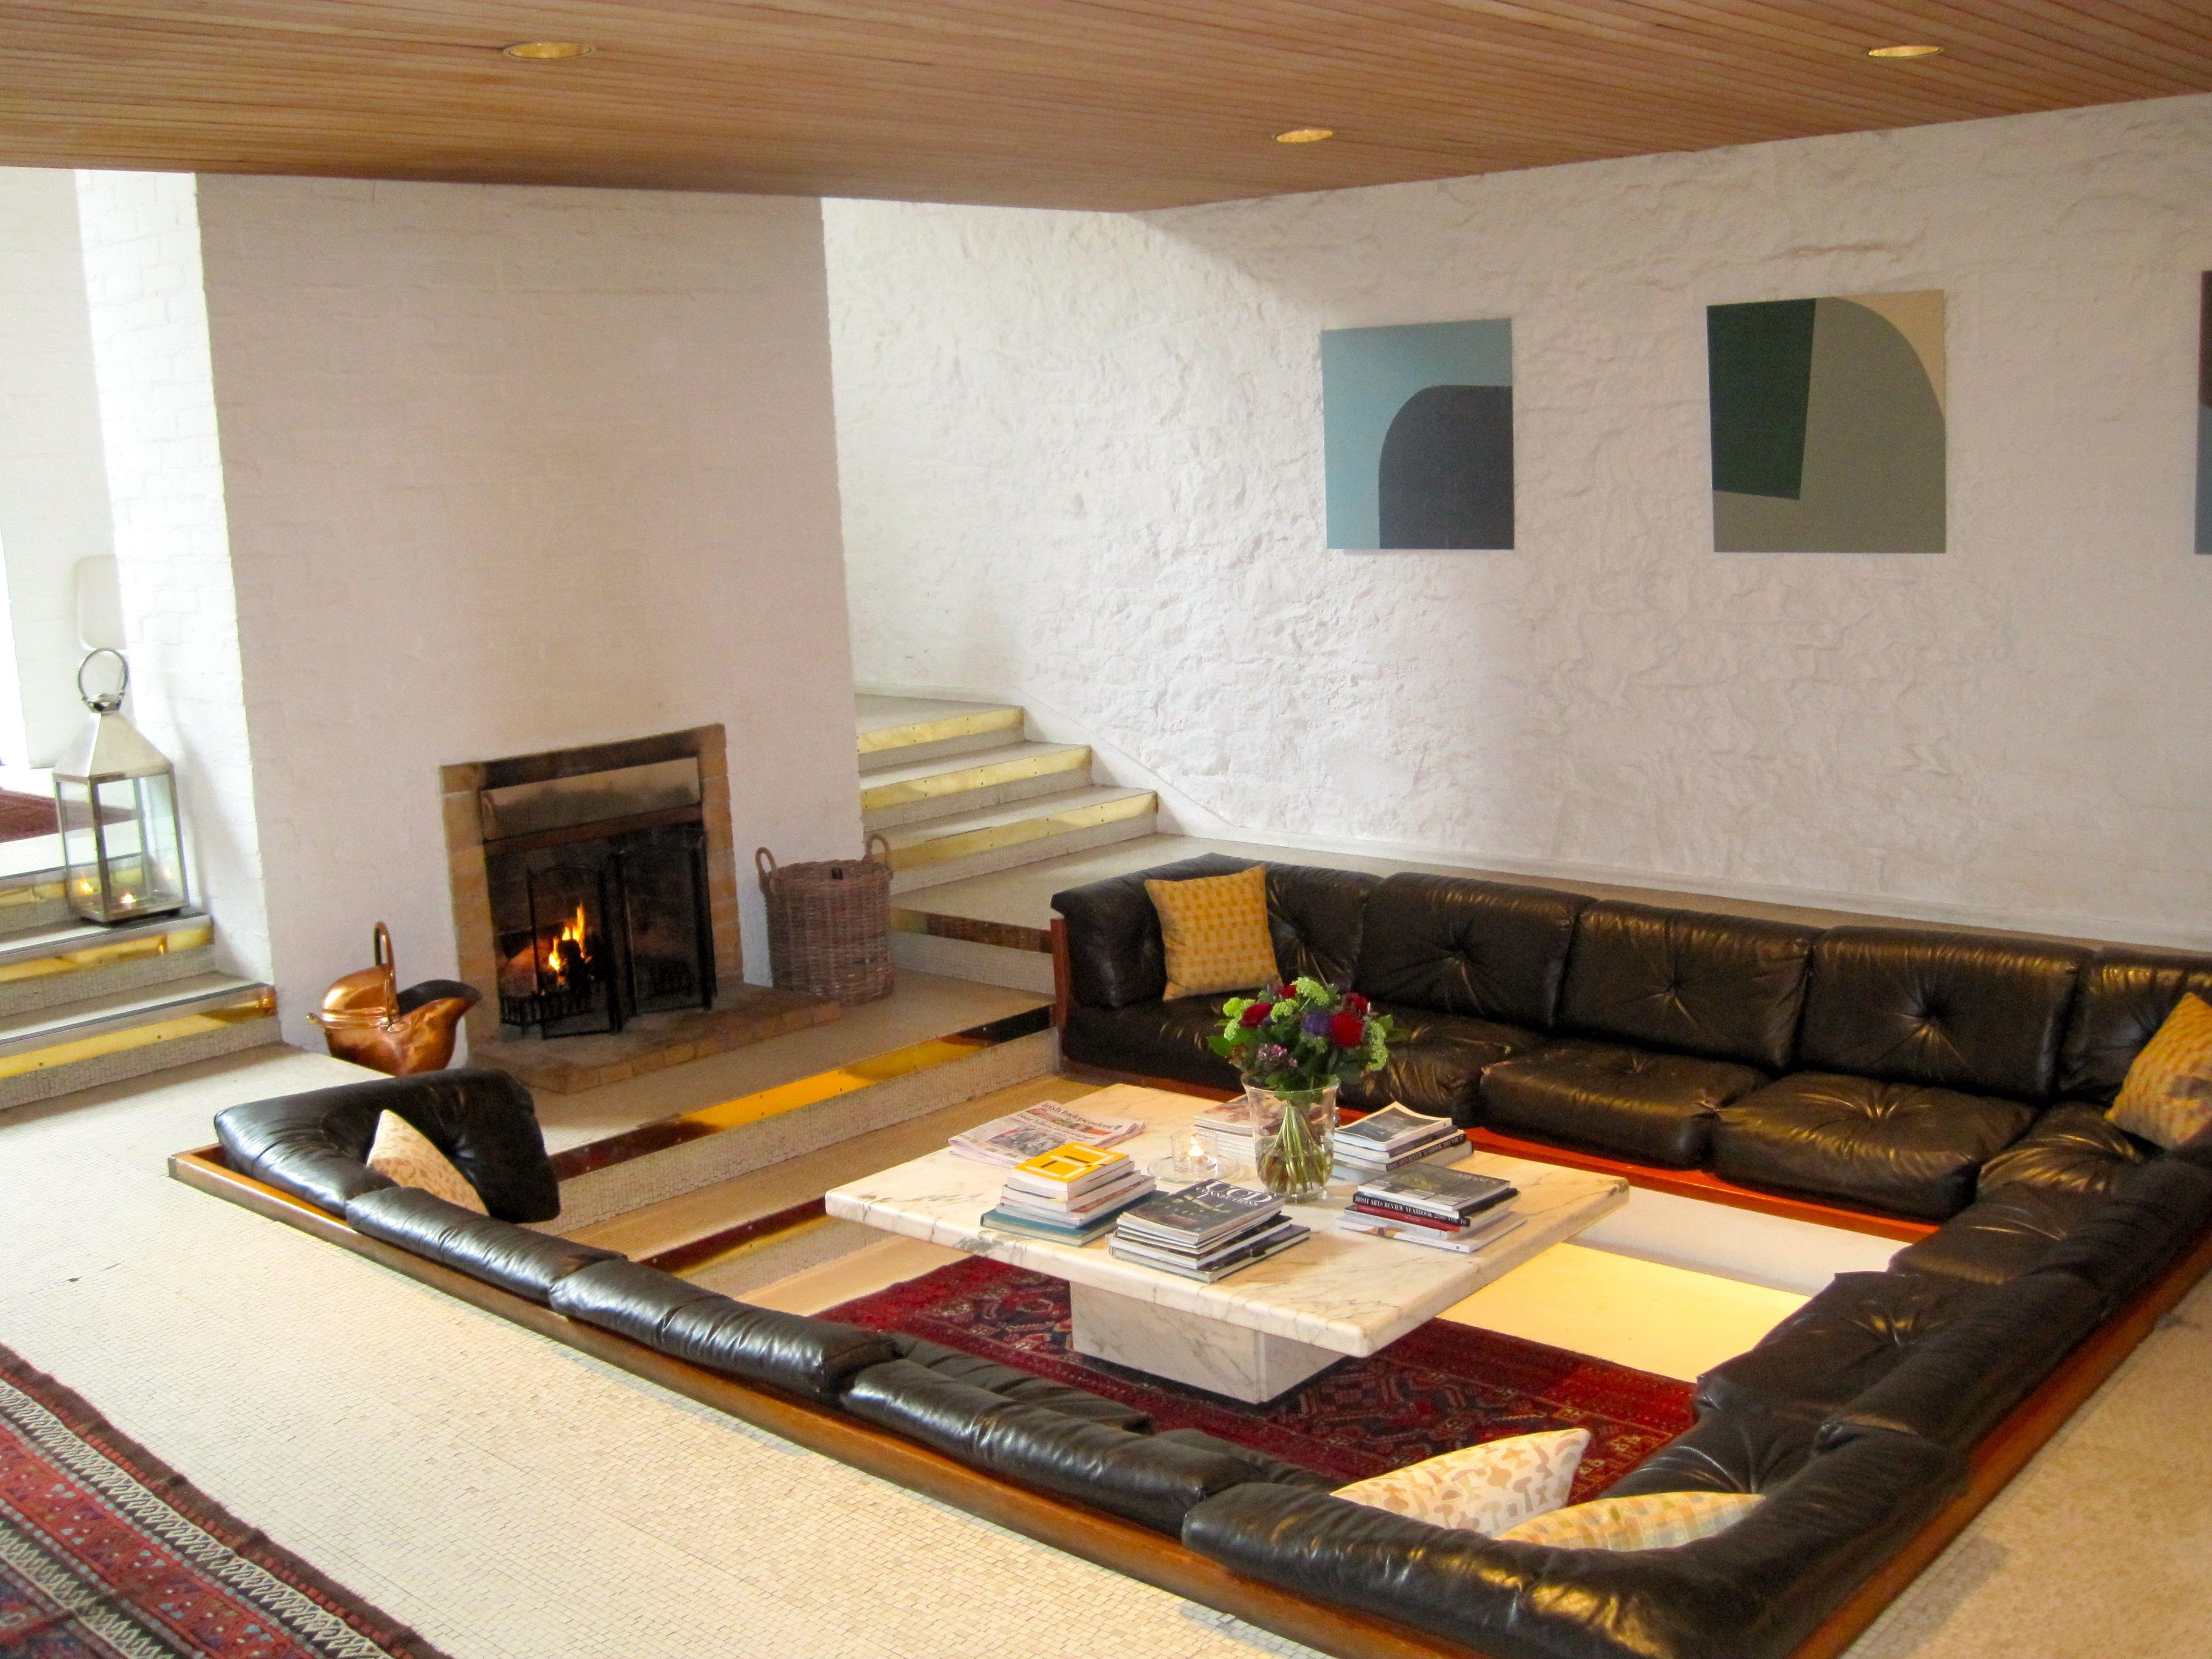 Sunken Square Seating Area  60's Design  Pinterest  Modern Mesmerizing Indian Seating Designs Living Room Design Decoration